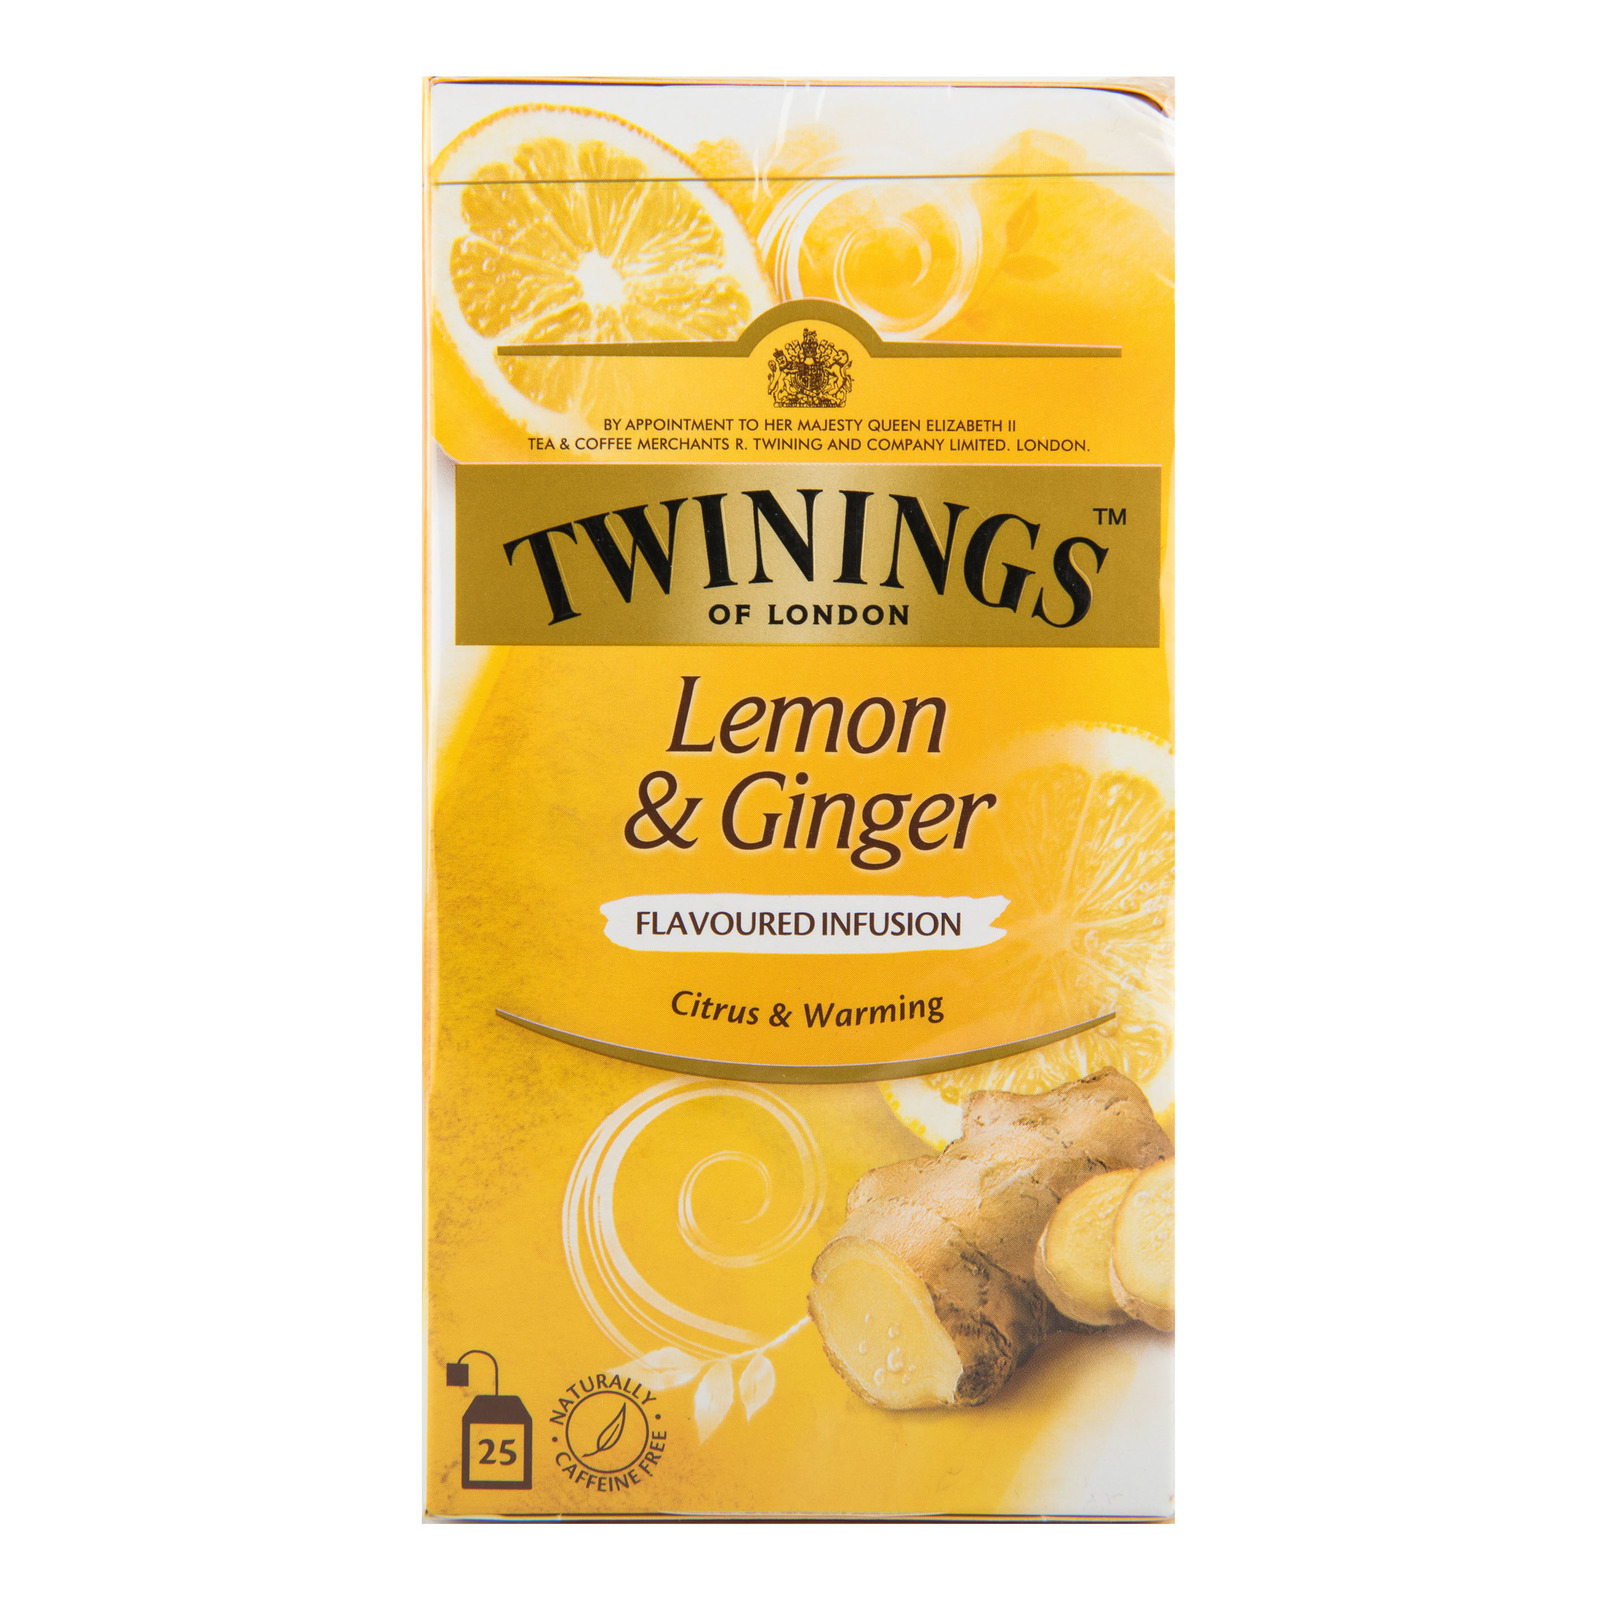 Twinings of London Lemon & Ginger